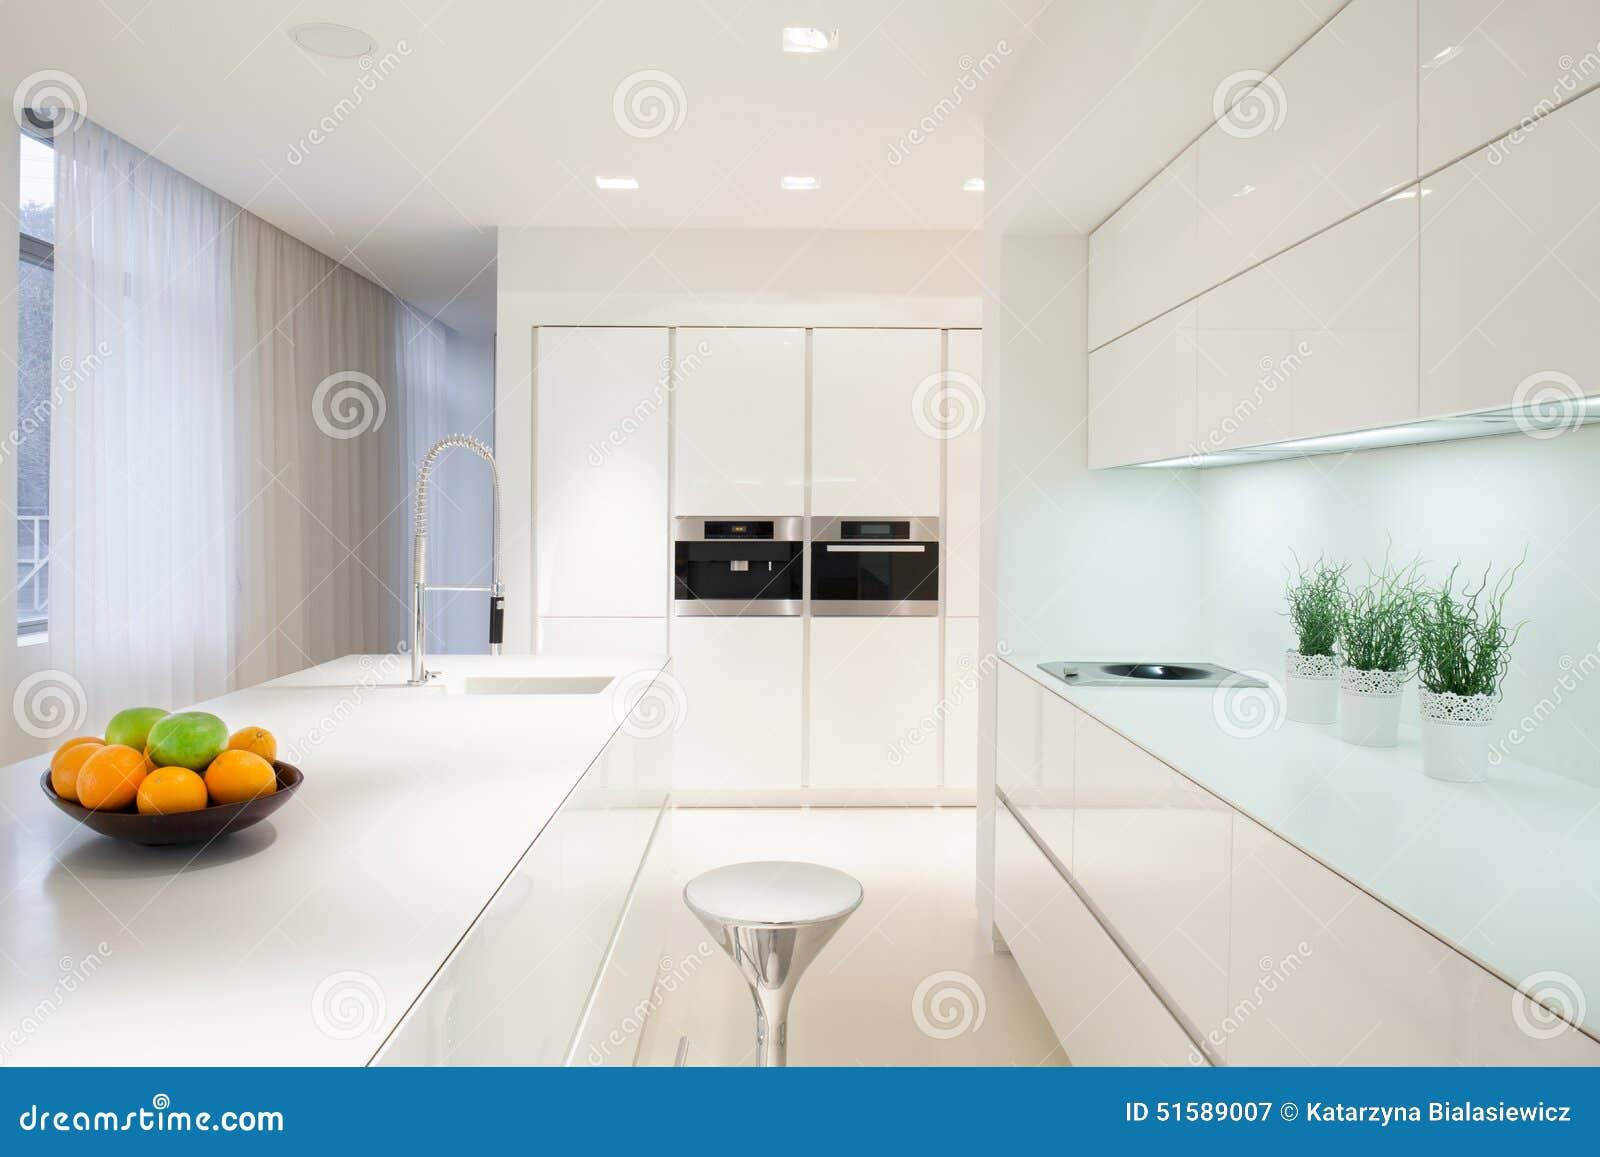 Exclusief wit keukenbinnenland